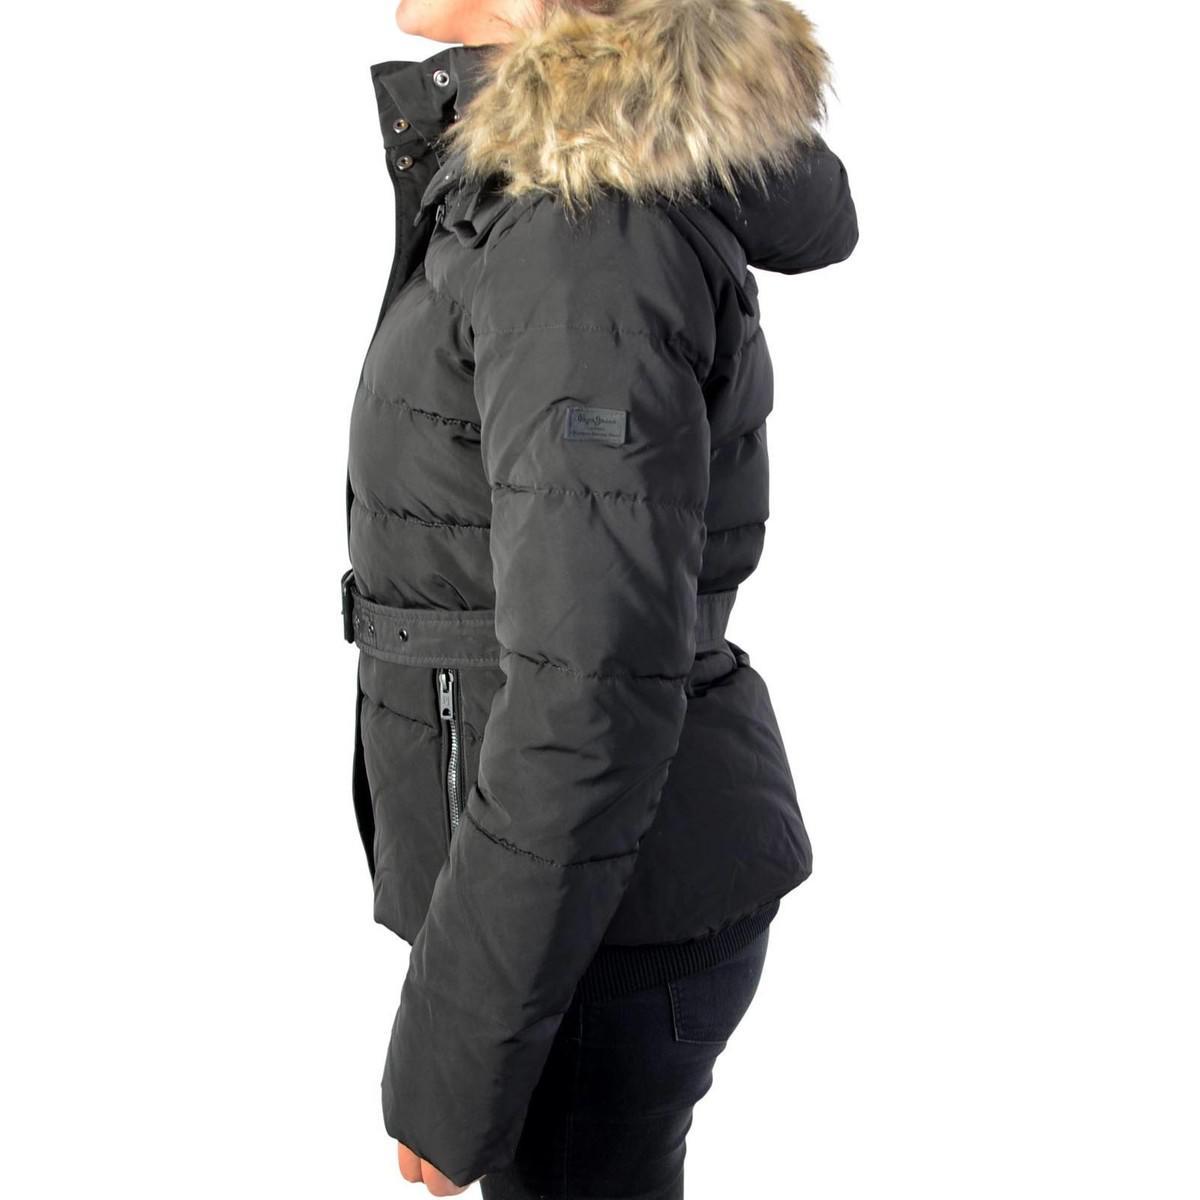 9410a7c8edfa Pepe Jeans Jacket Claris Pl401256 Black 999 Women s Jacket In Black ...